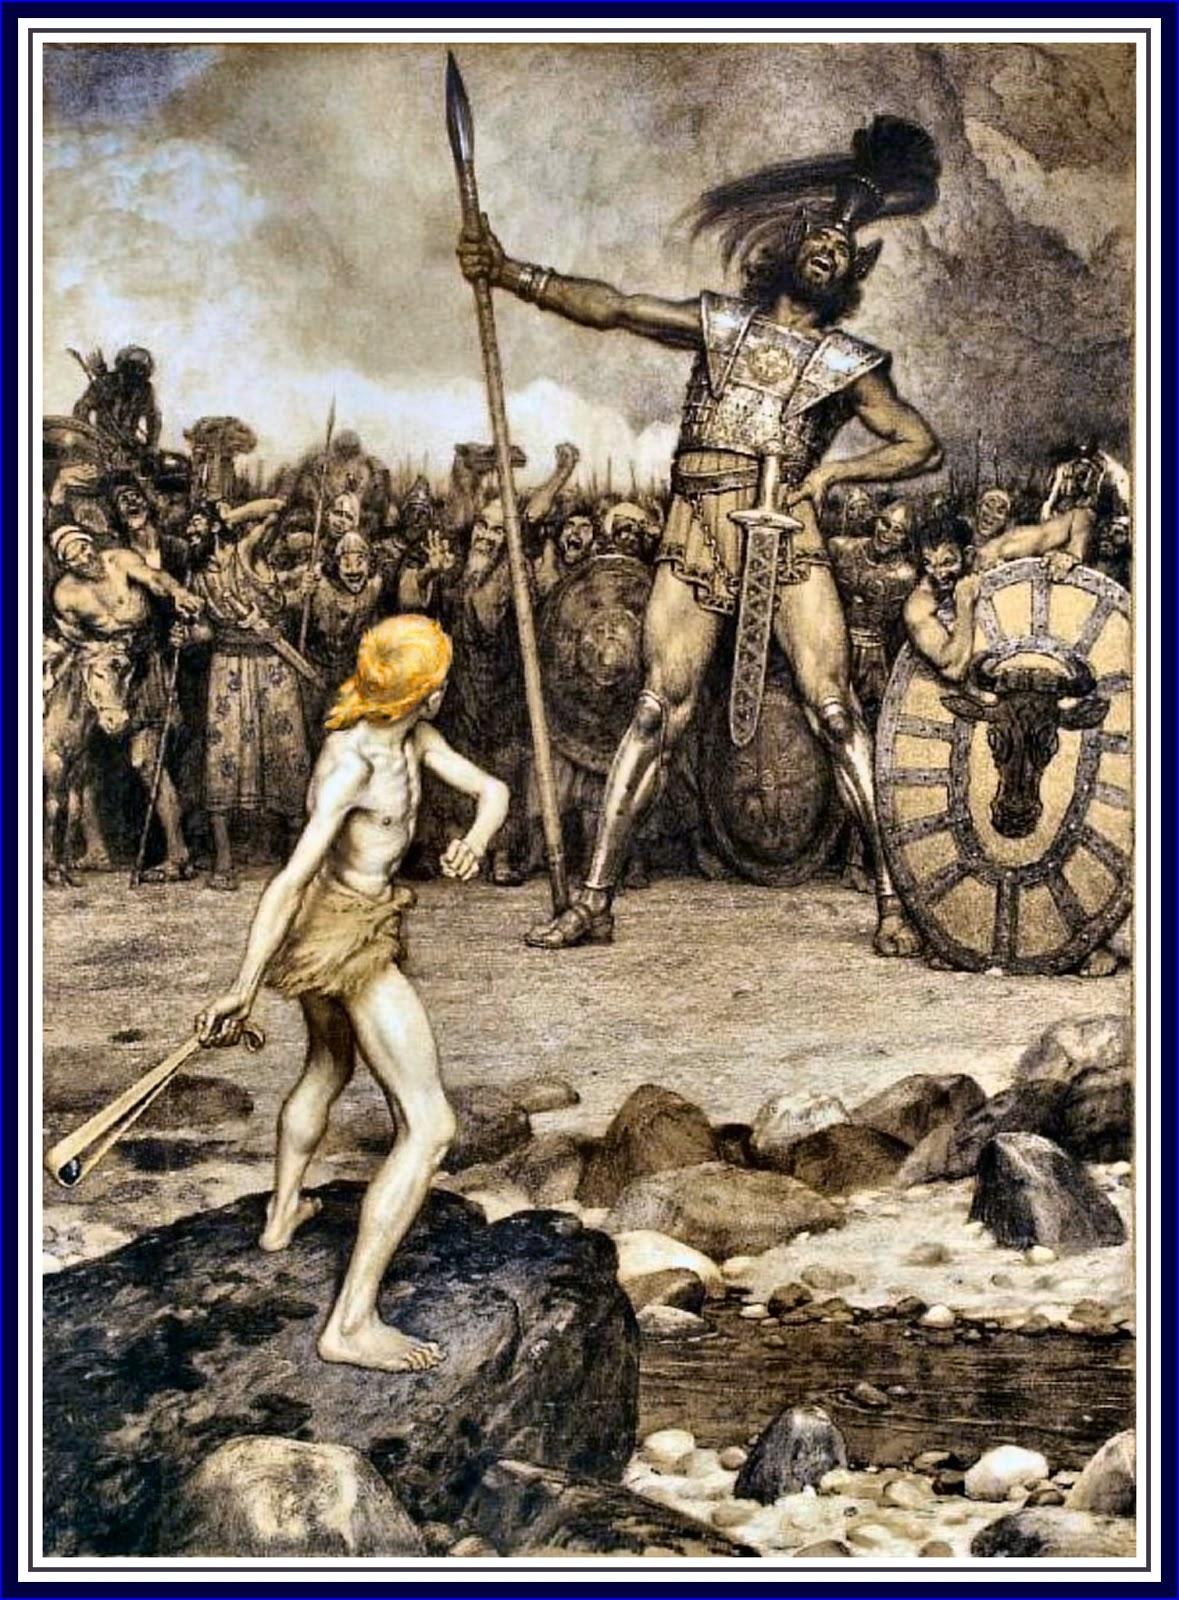 Osmar_Schindler_-_David_und_Goliath wikipedia